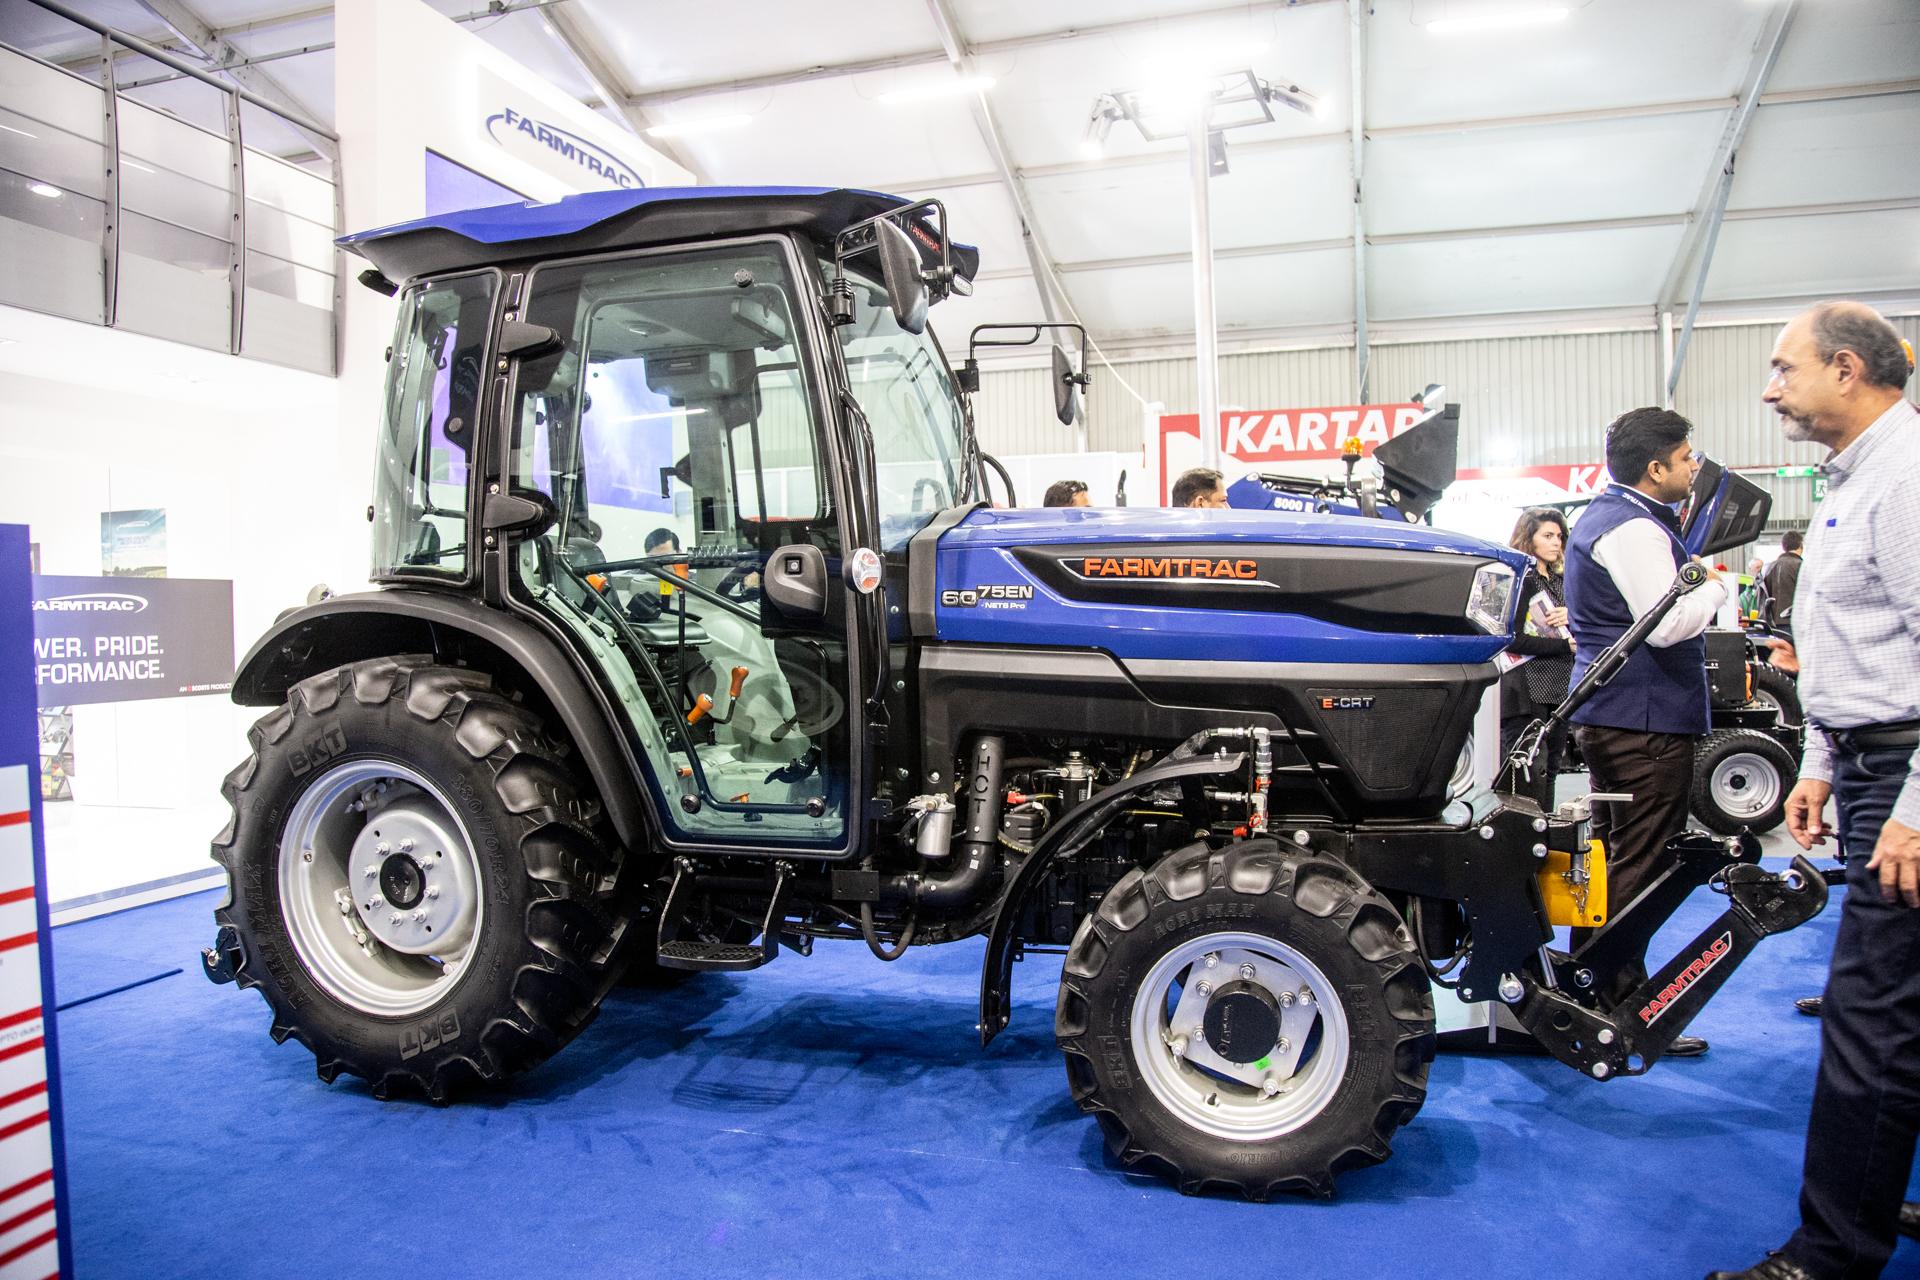 Farmtrac Displays Range of Smart Tractors and Farming Implements at